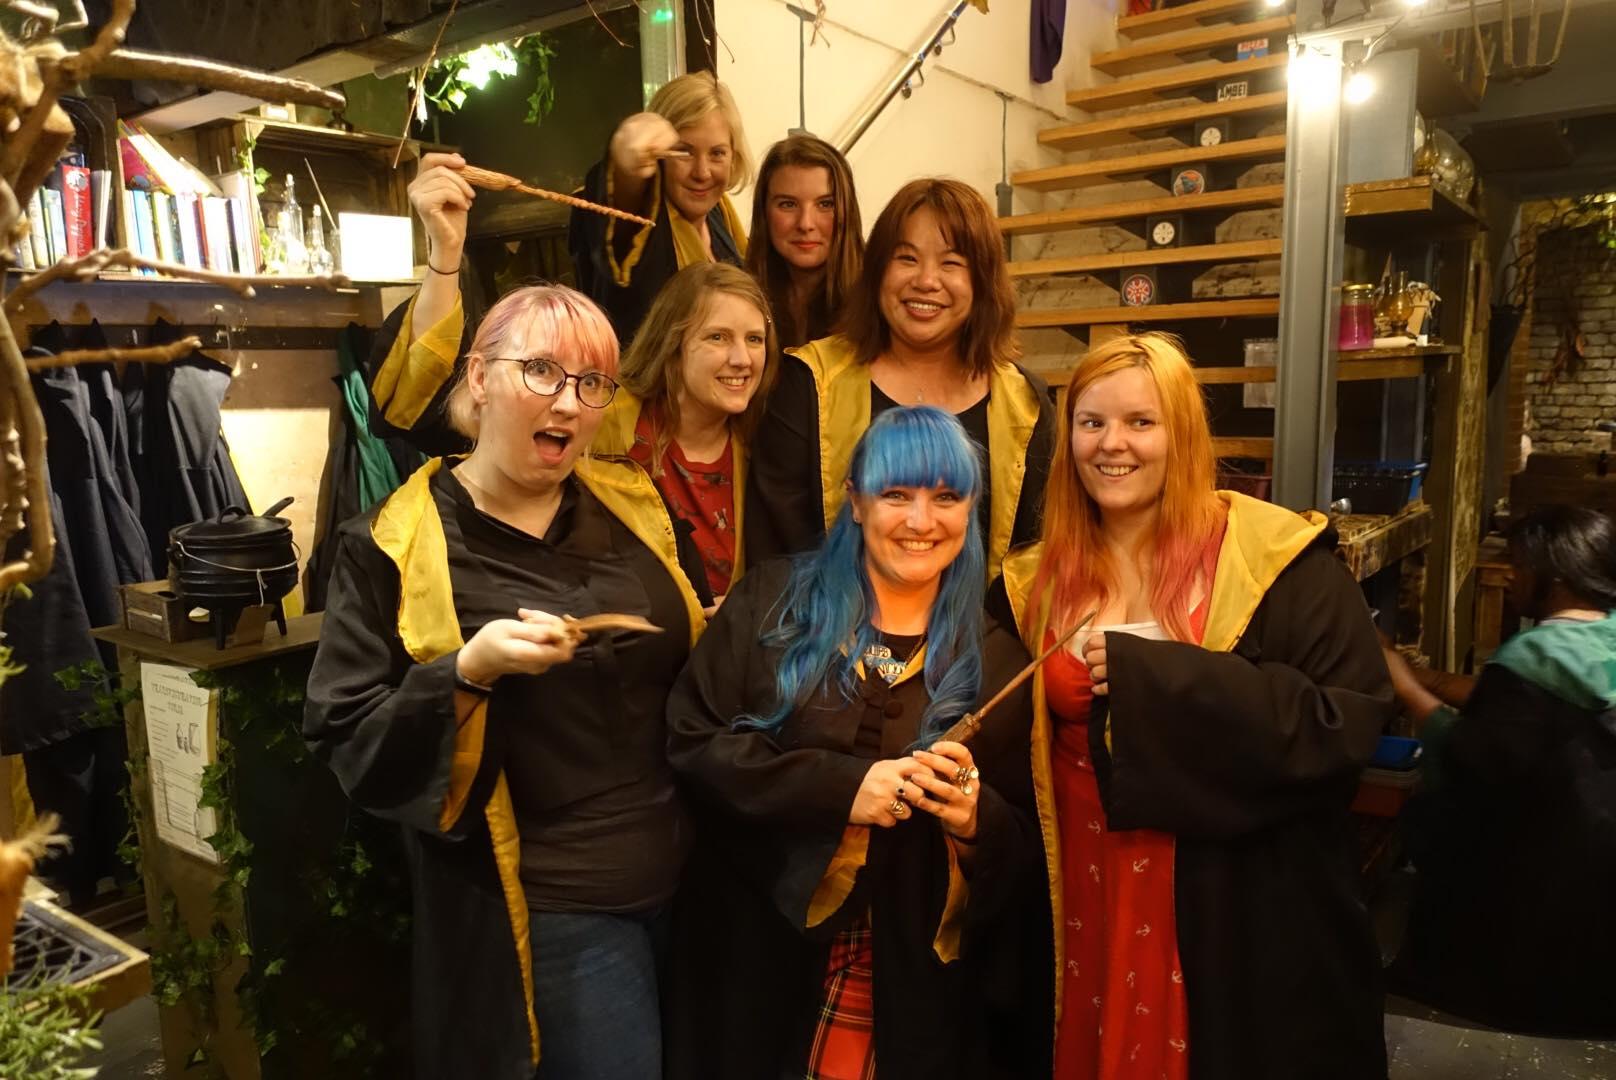 us at the cauldron